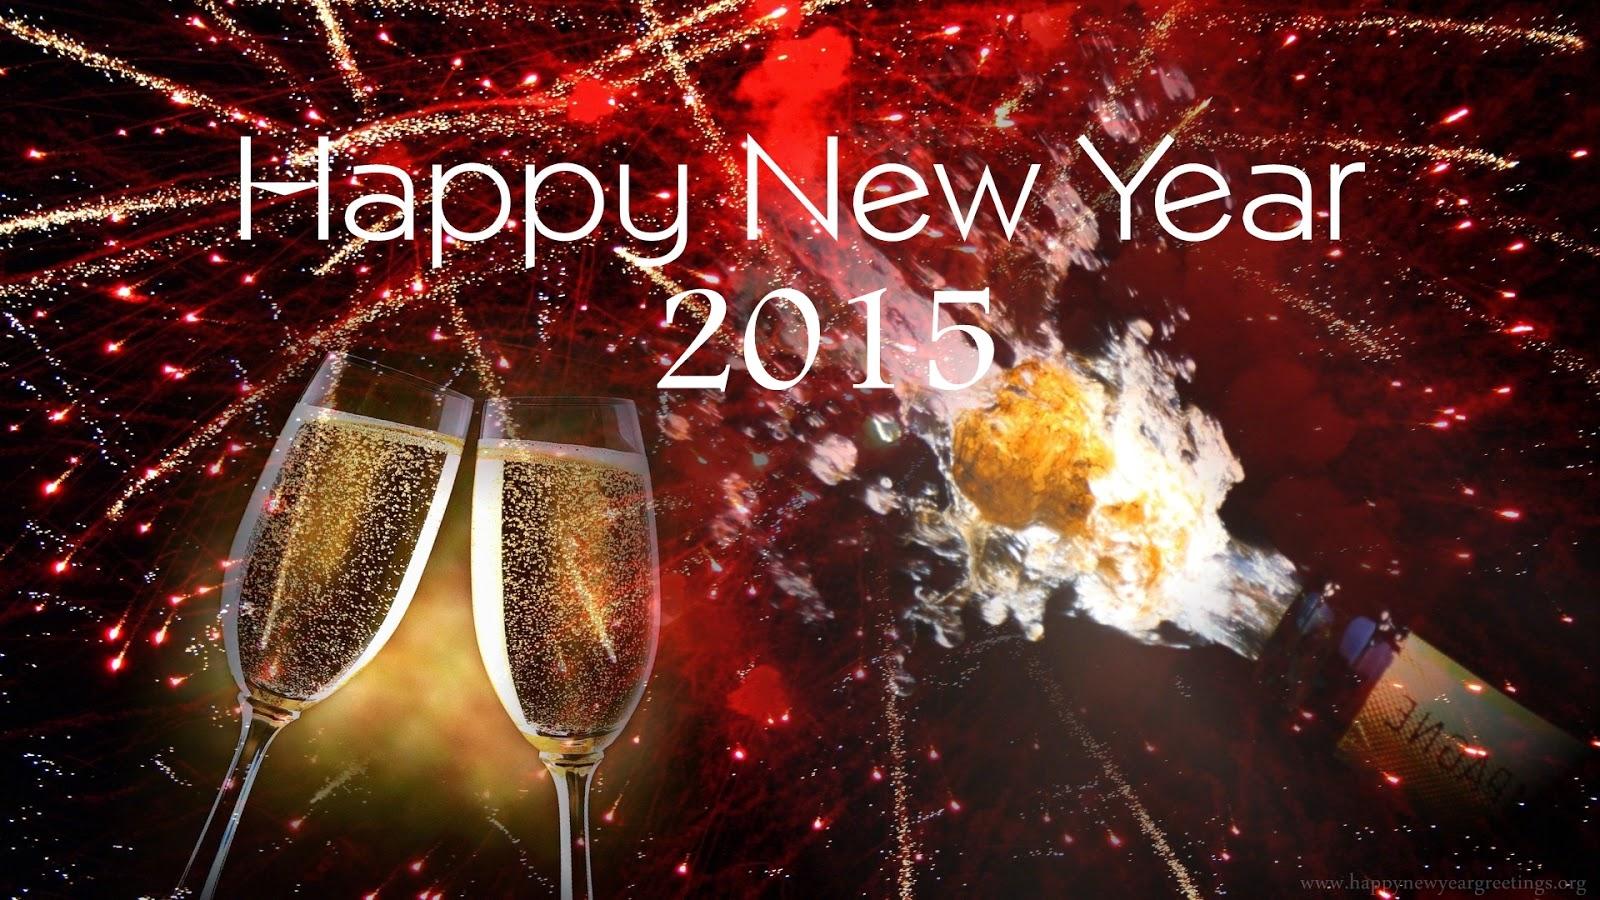 happy new year 2015 - #happynewyear2015 #ToastDrink #Champagne #fireworks